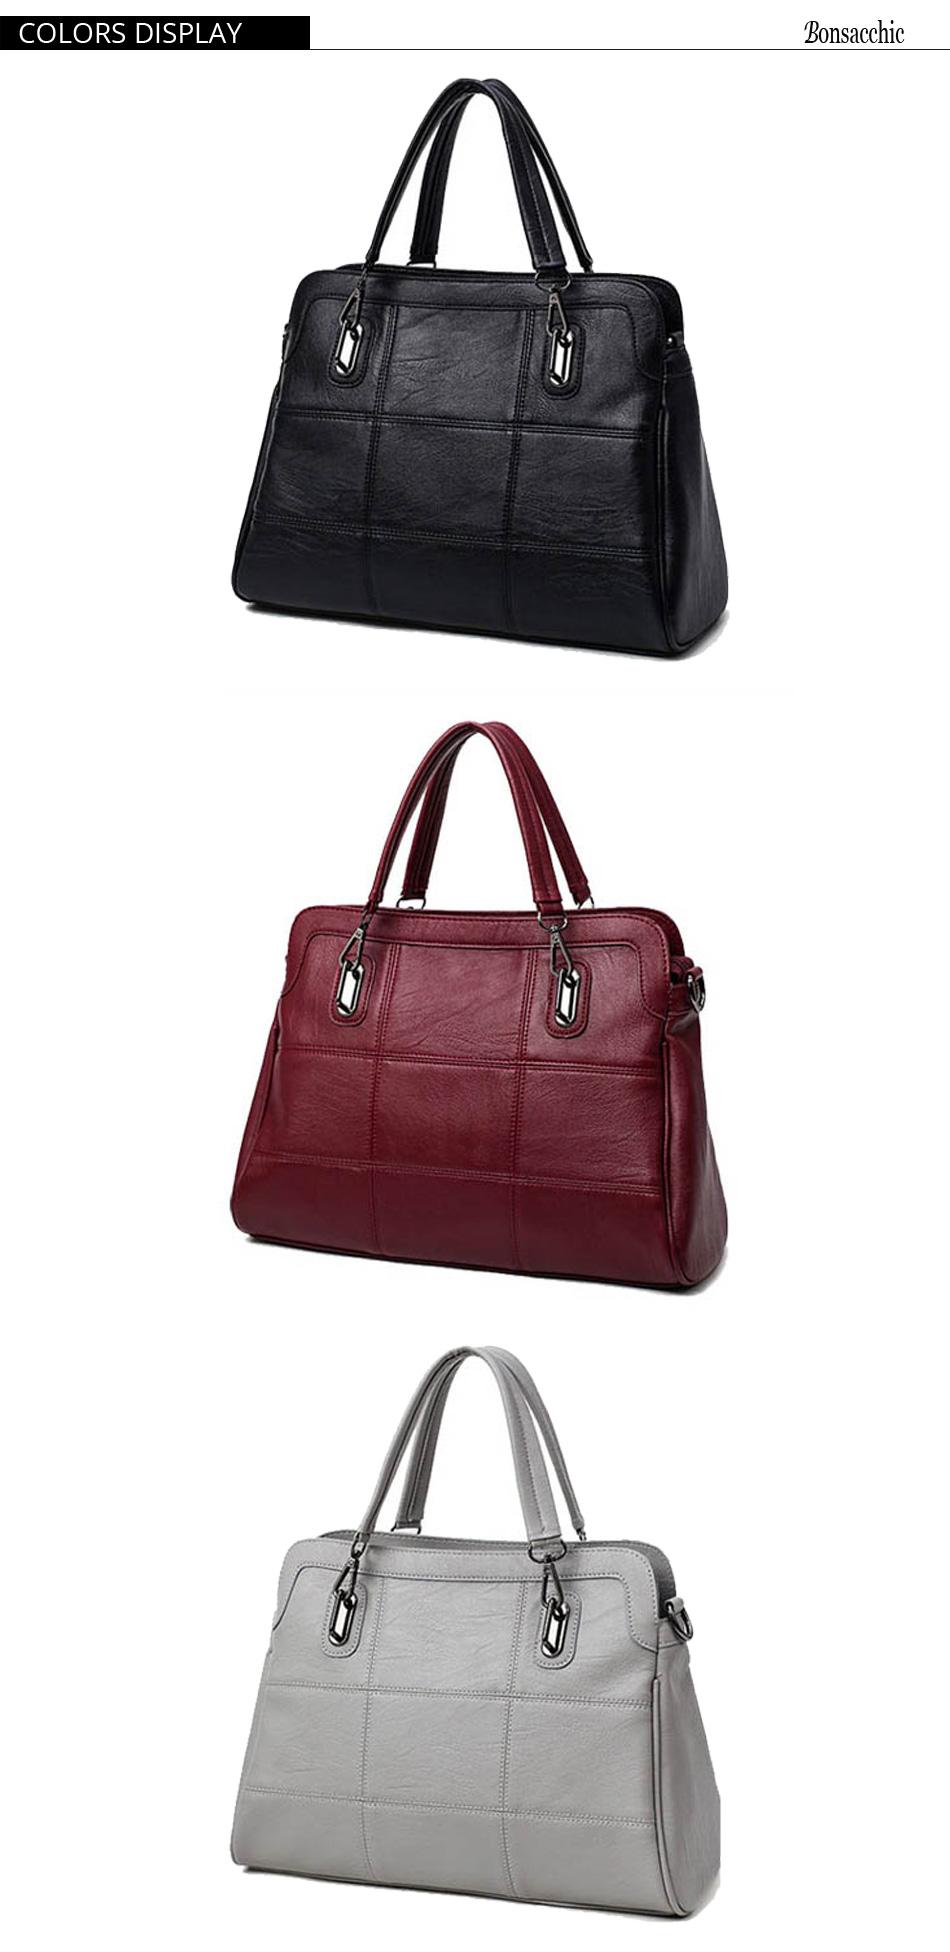 Bonsacchic Fashion Ladies Hand Bag Women's Genuine Leather Handbag Black Leather Tote Bag Bolsas femininas Female Shoulder Bag 7